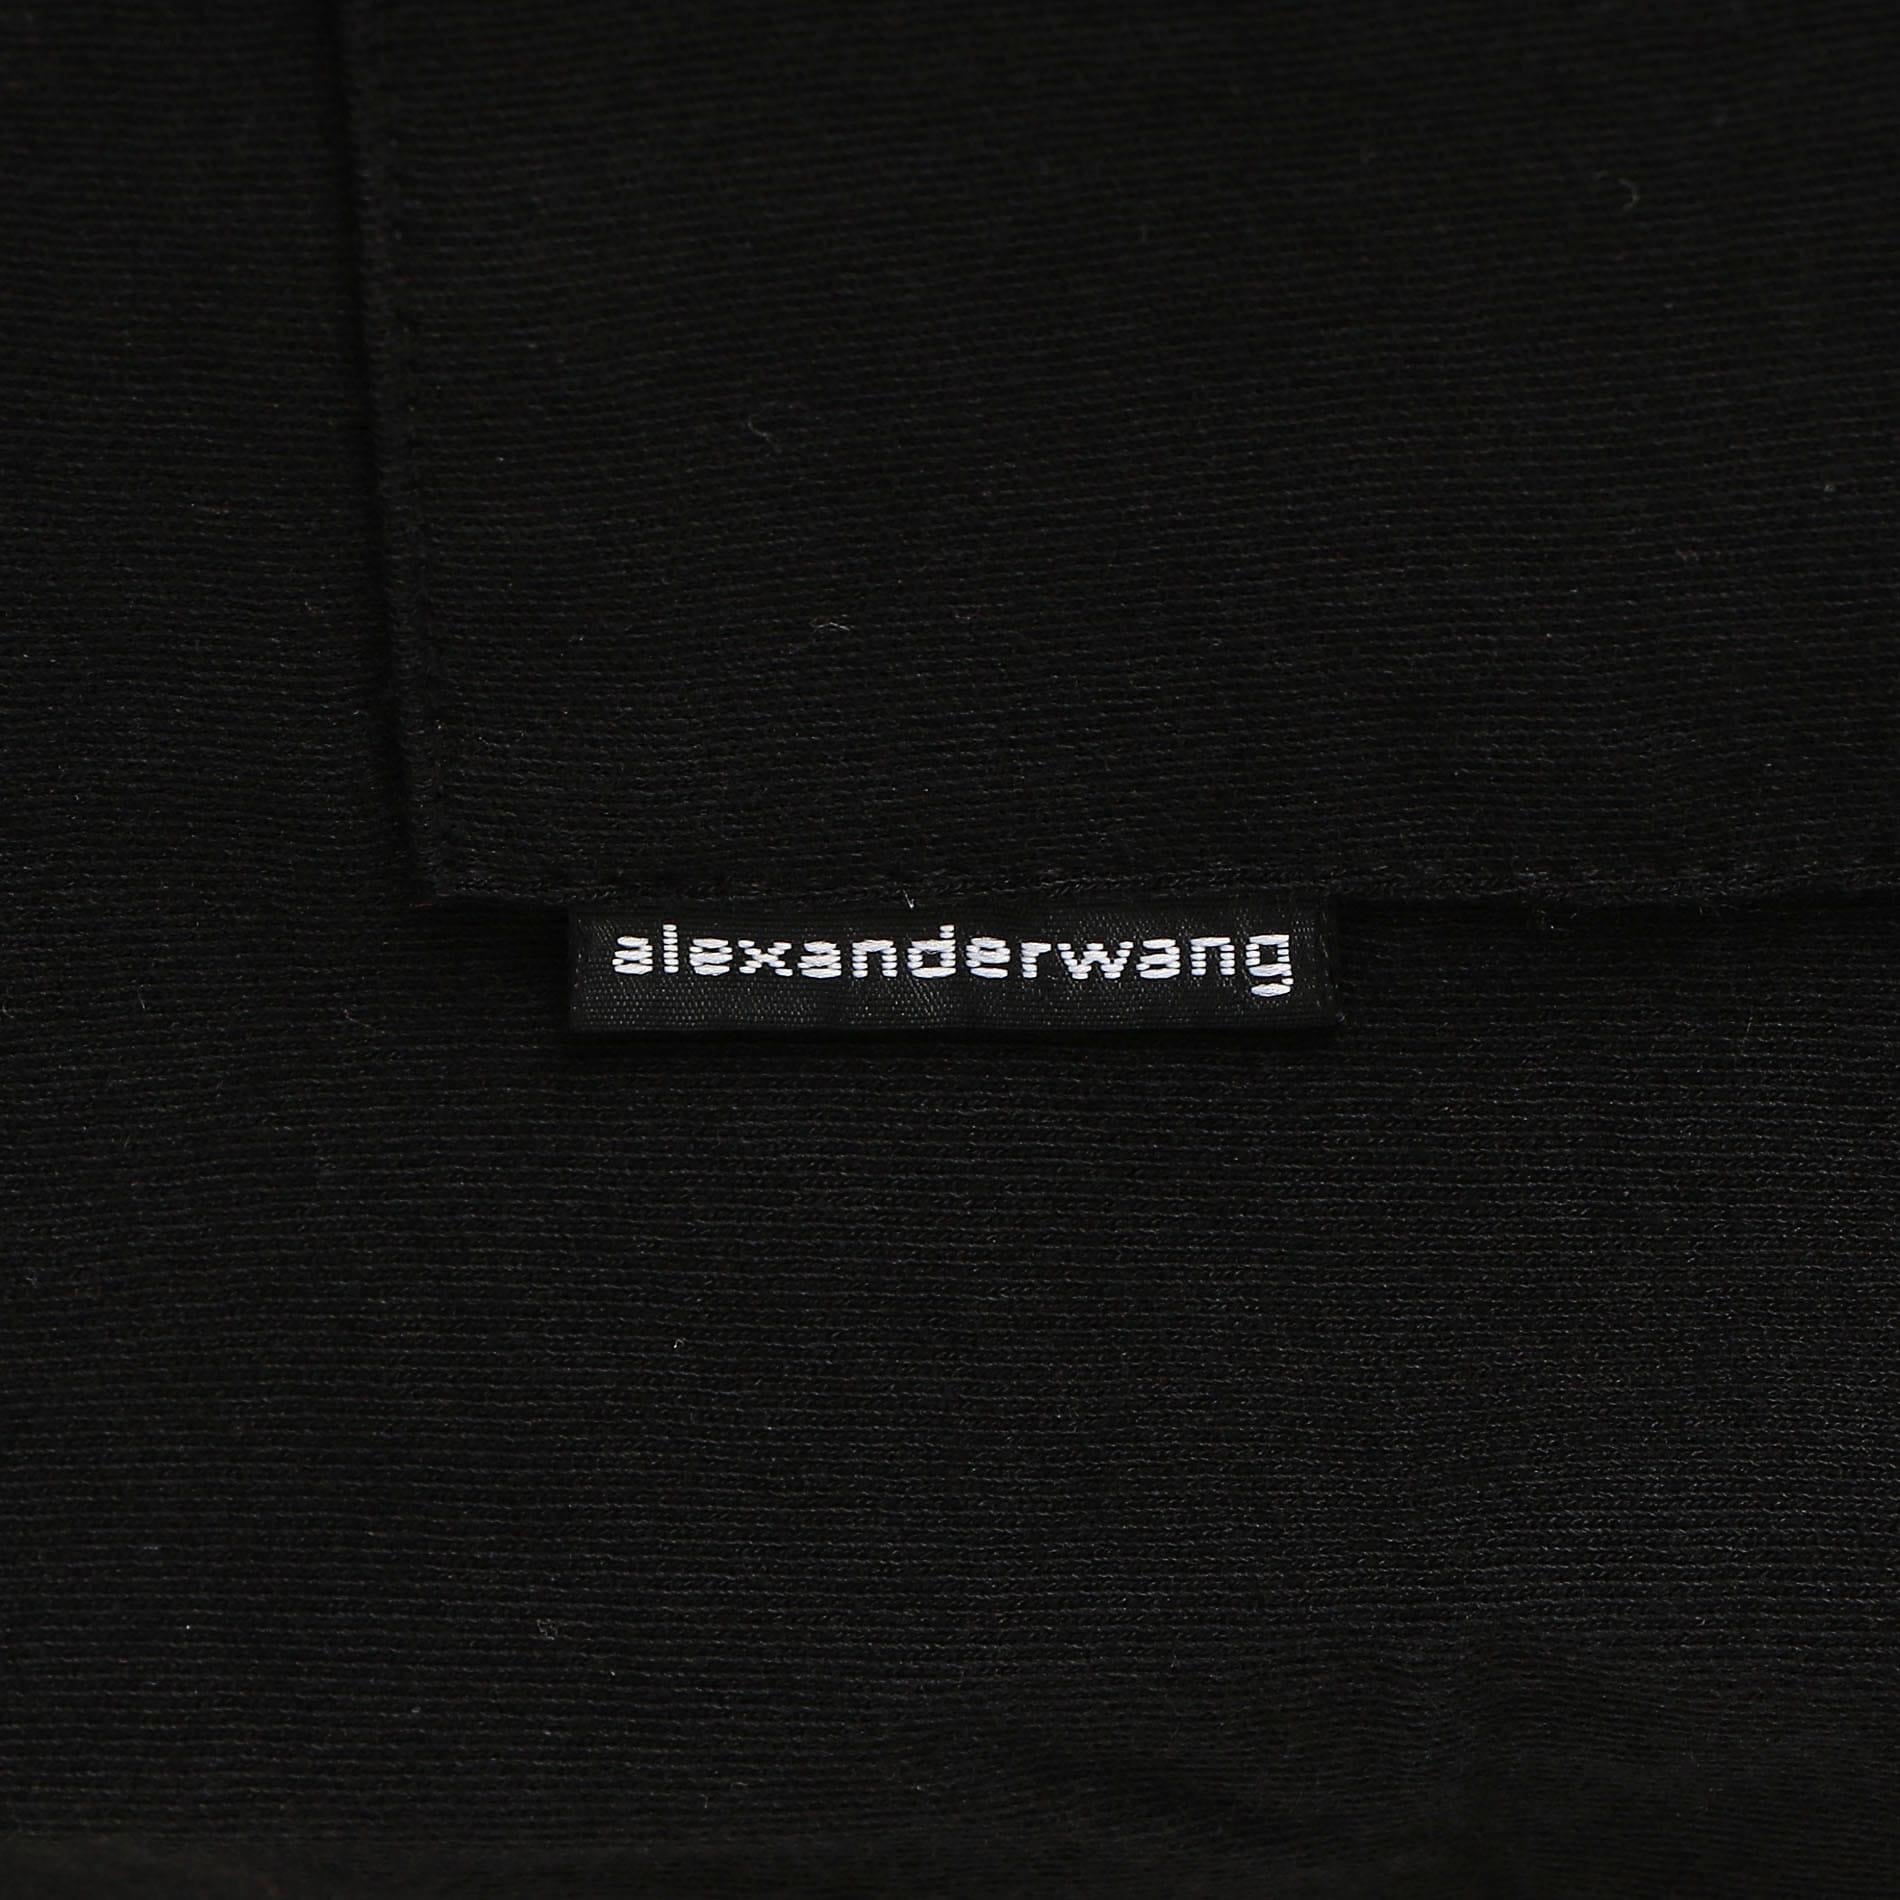 【alexander wang.T】WOMEN ジャージドレス 4C196022